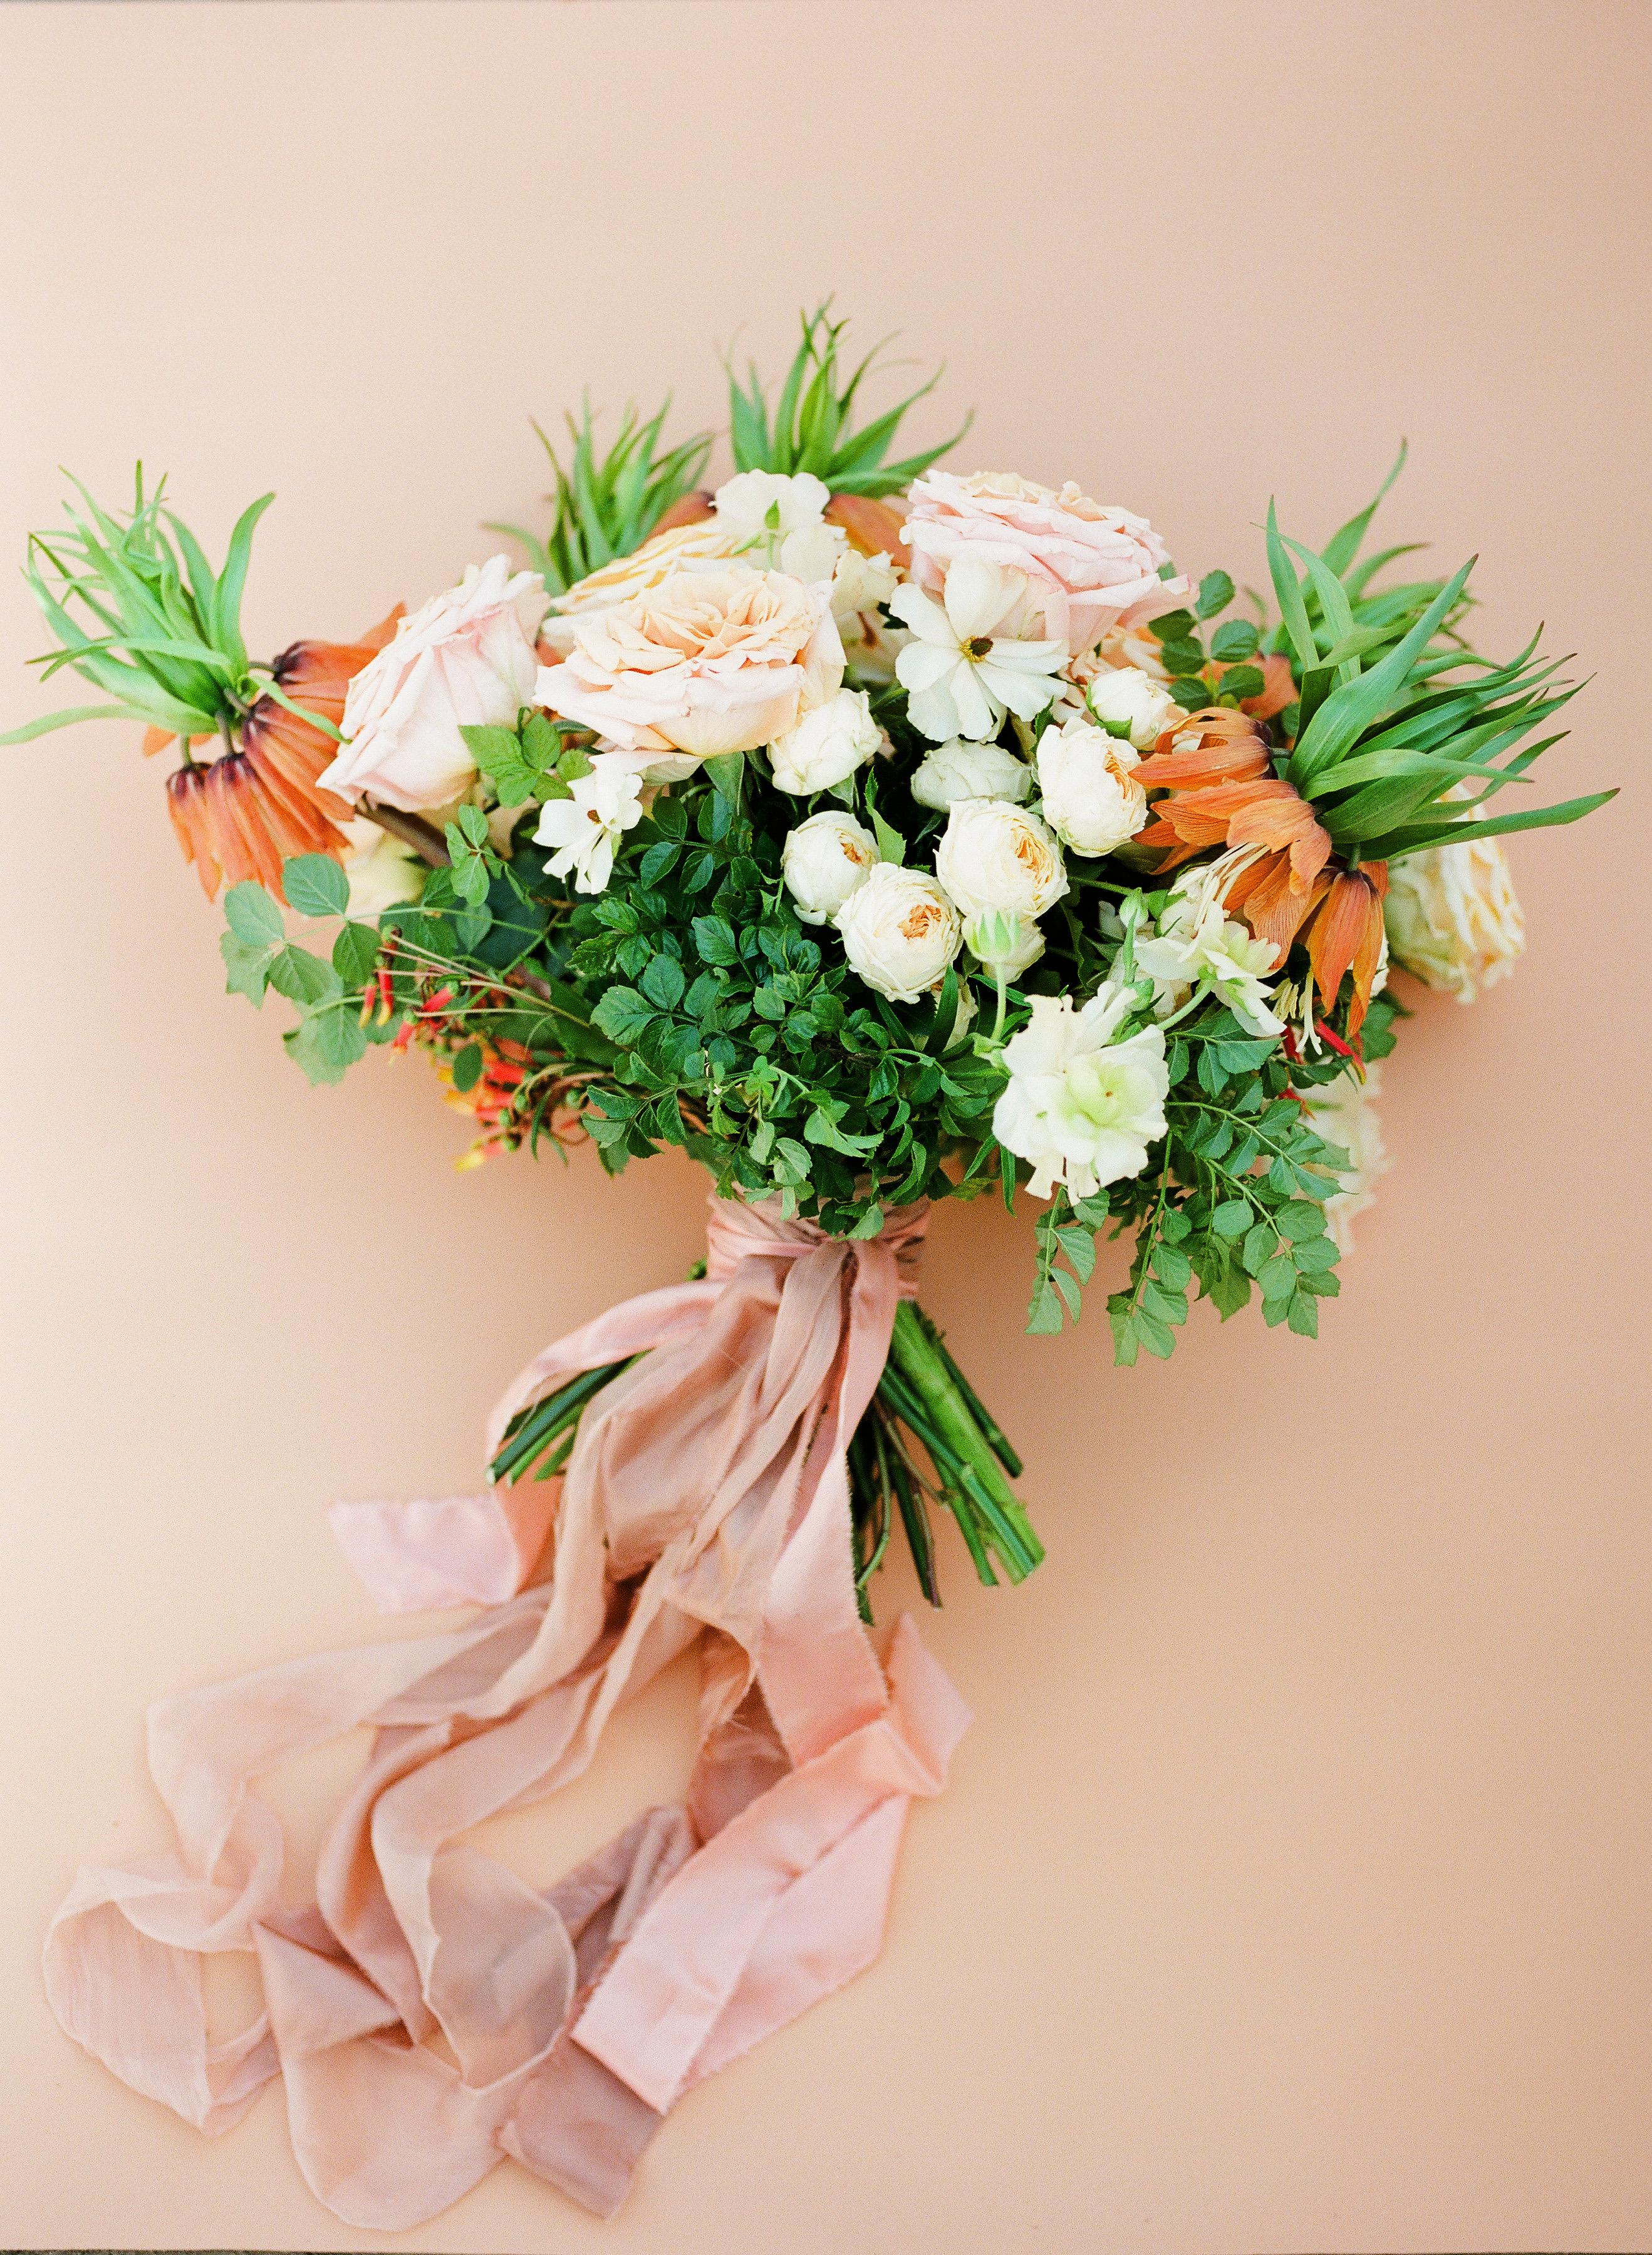 Tenley molzahn taylor leopold wedding bouquet flowers